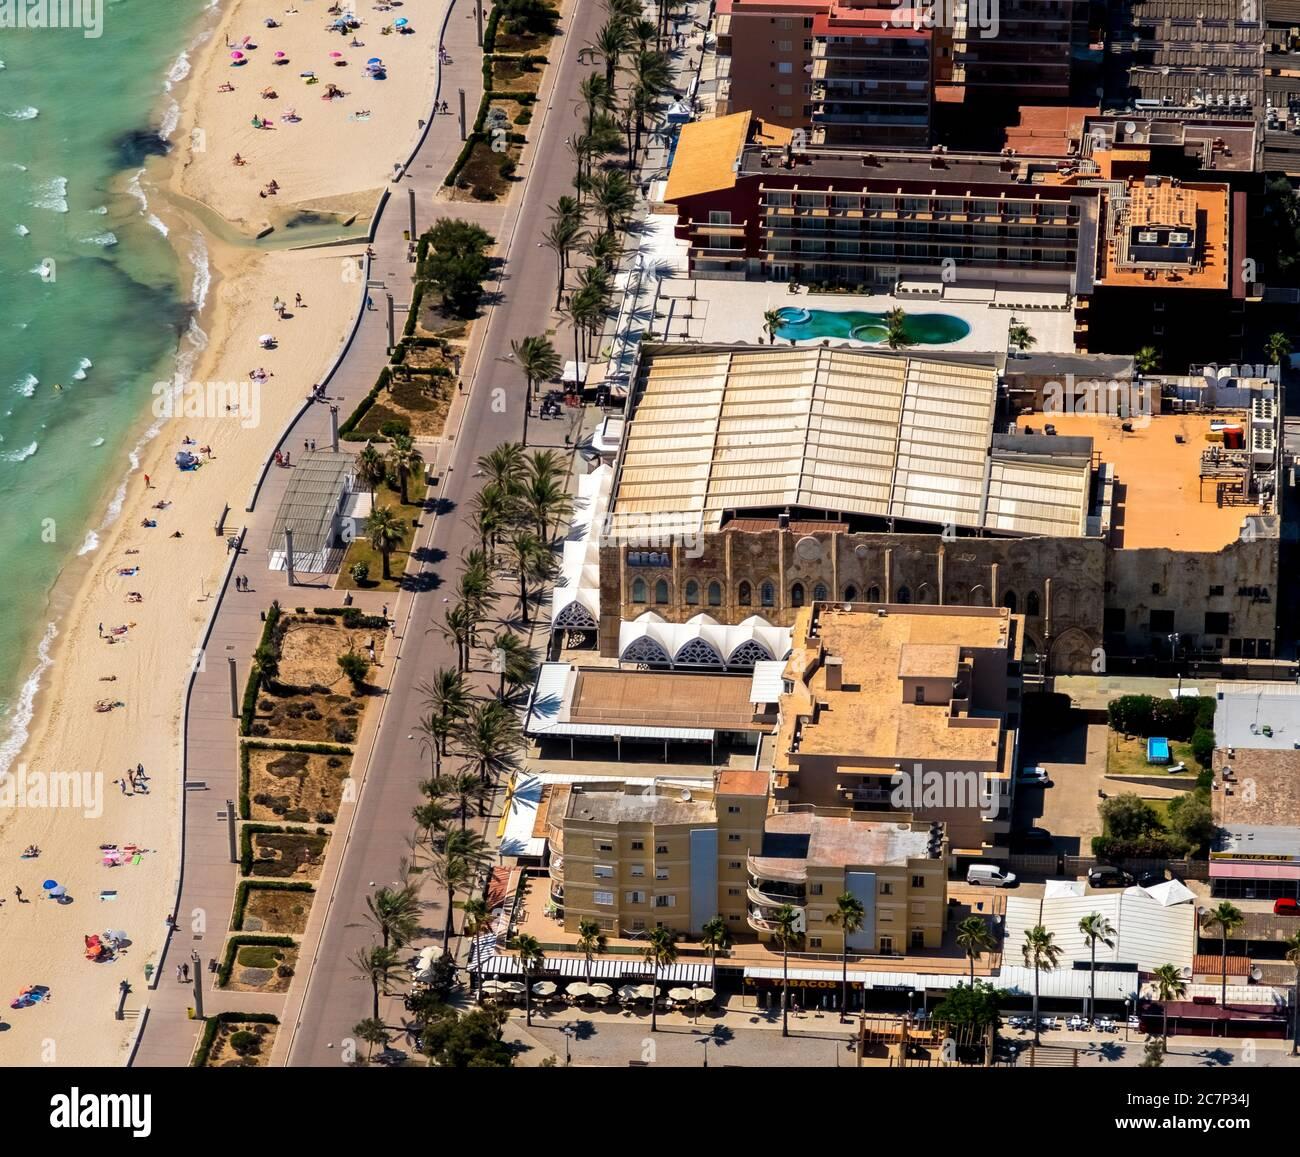 Luftbild, geschlossener großer Disco-Mega-Park, Strand von Arenal mit Balneario 5, Balneario 6, Balneario 5, S'arenal, Arenal, Ballermann, Europa, Balearen I Stockfoto